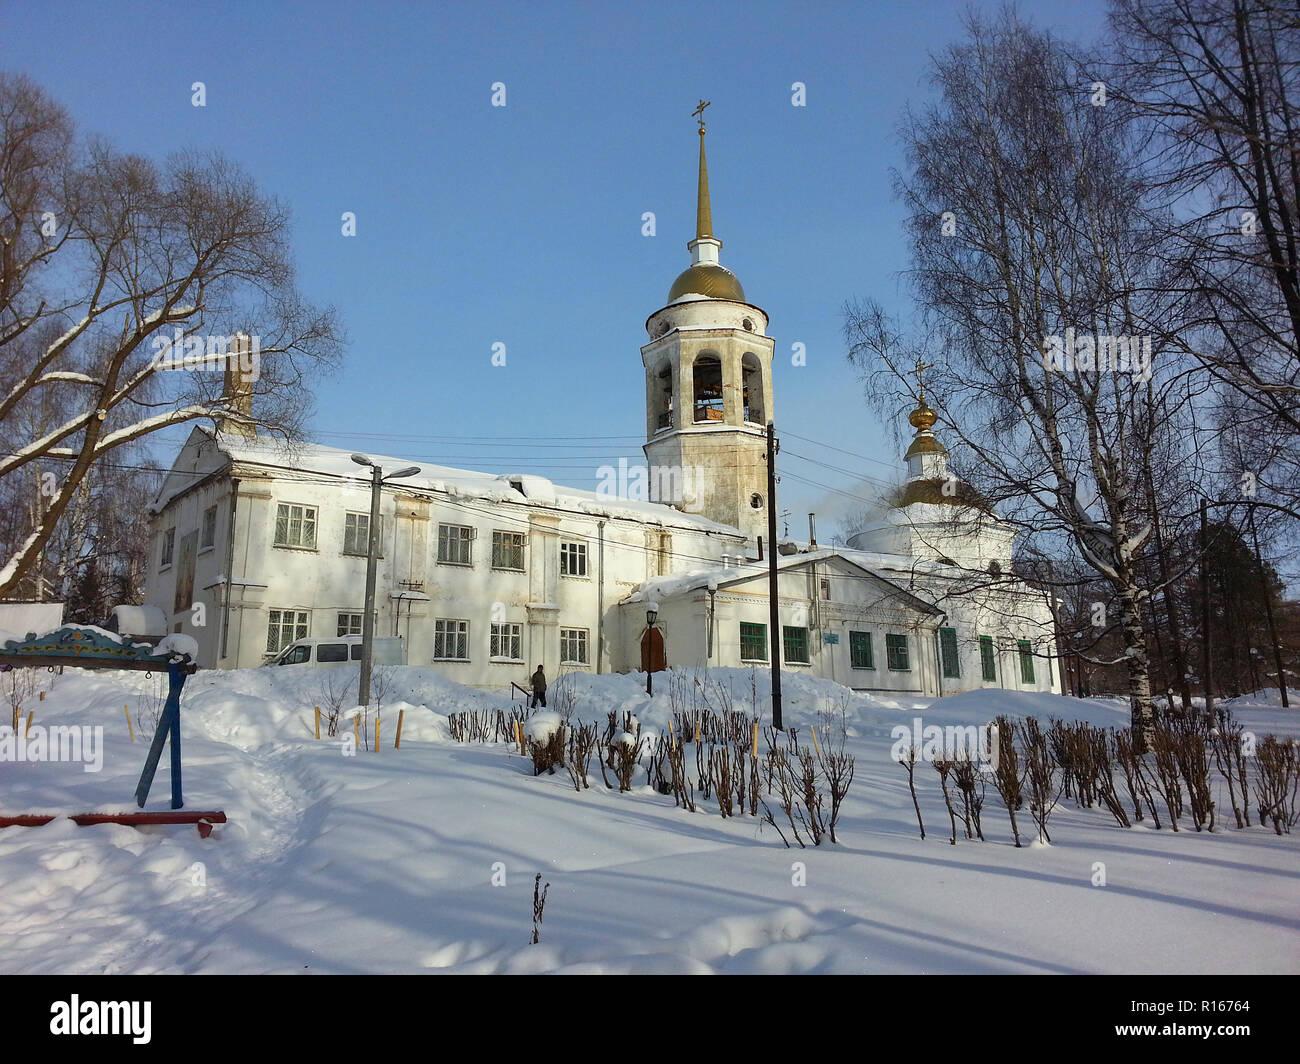 Sightseeings of the village of Khokhlovka (Perm region)